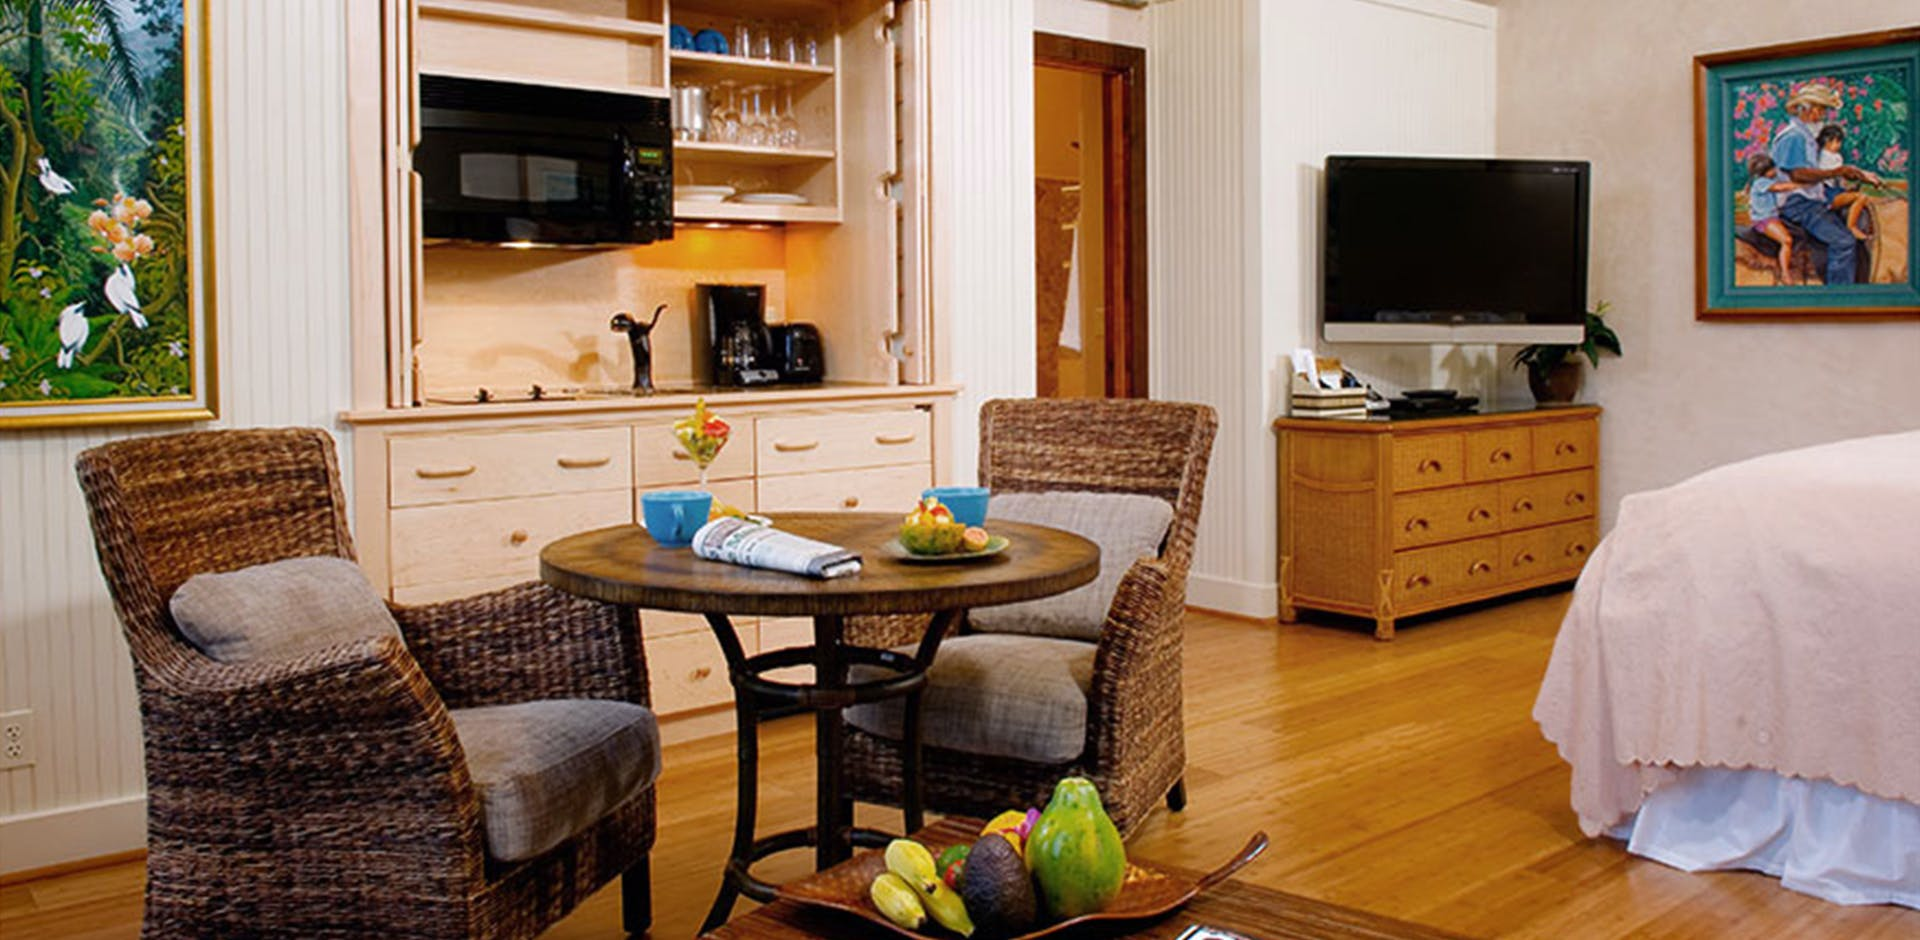 seating area, kitchenette